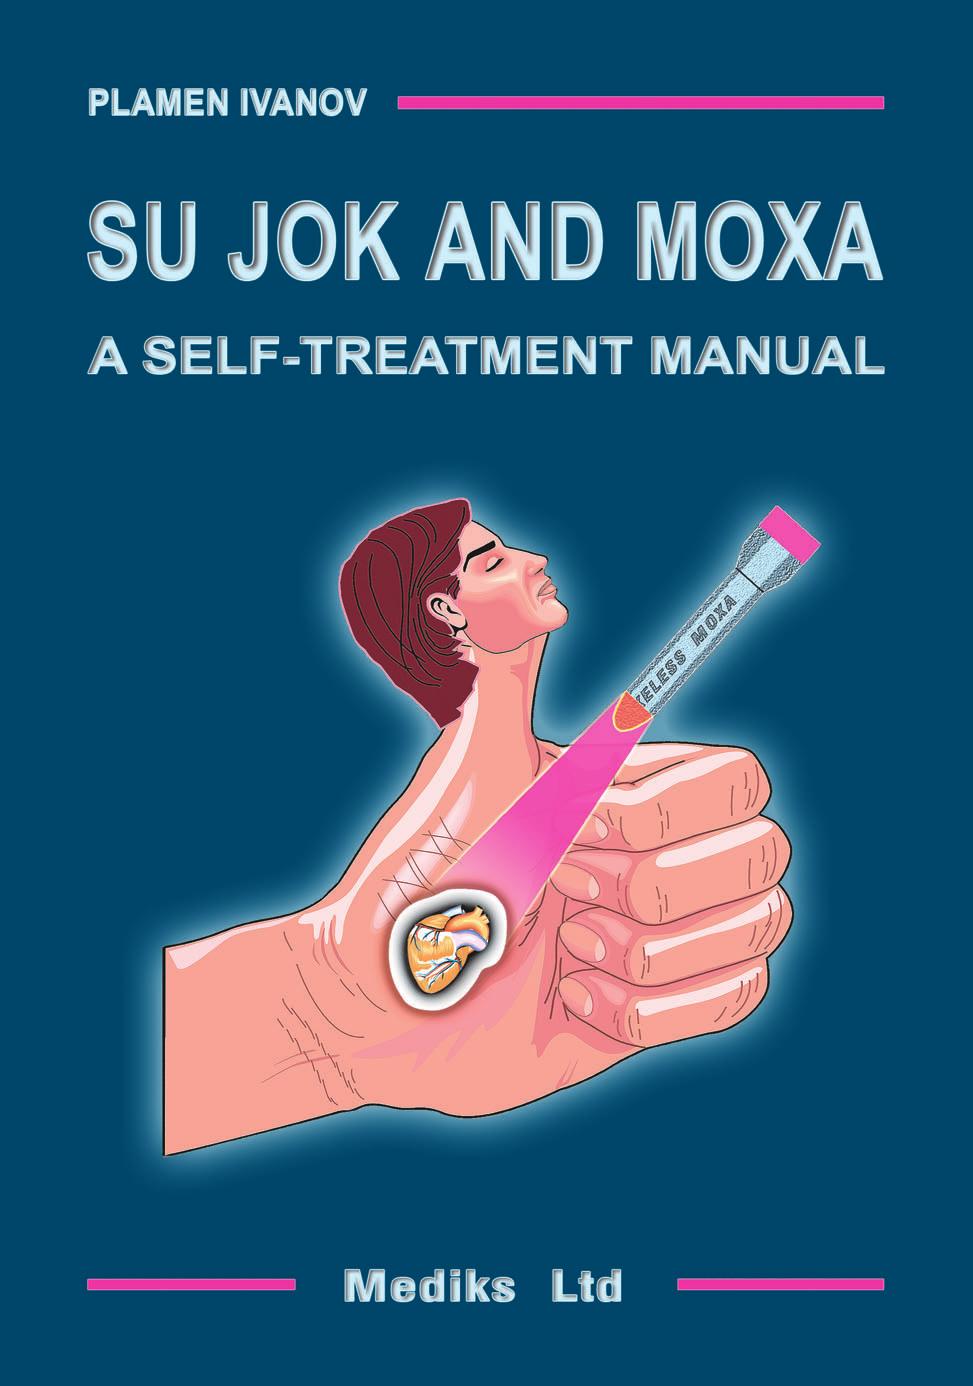 Su Joke Therapy Prostatitis)